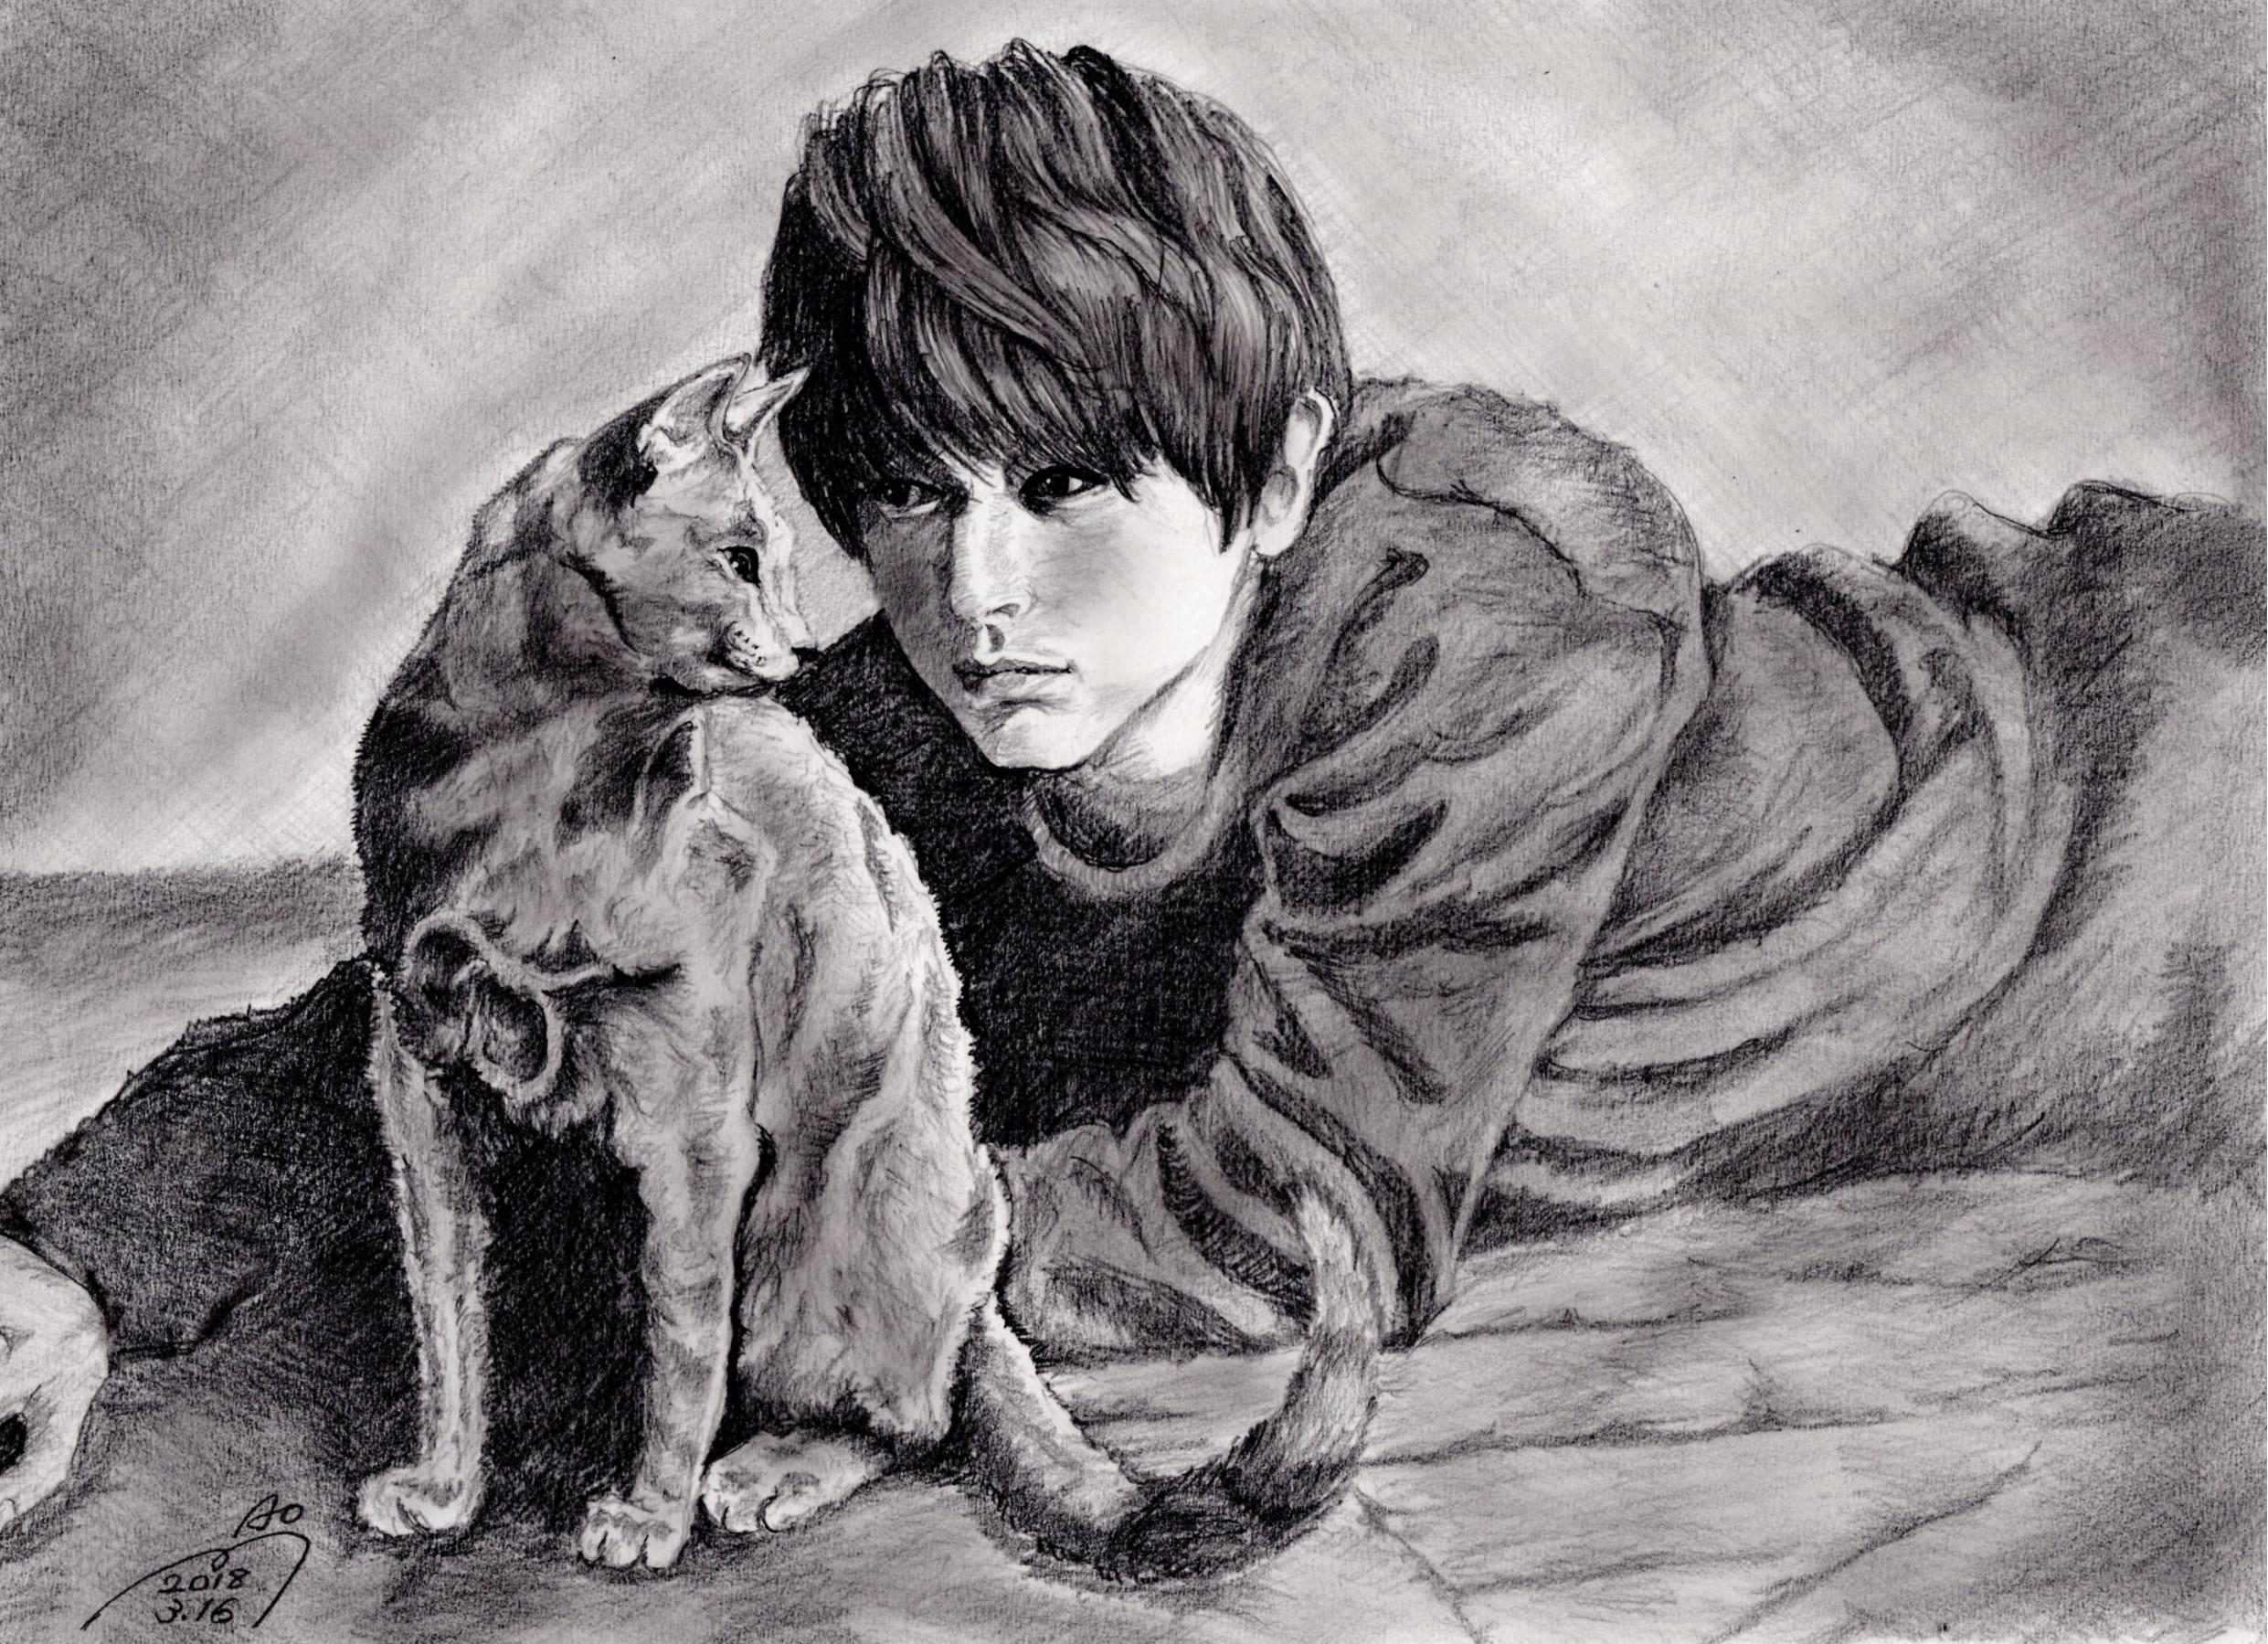 吉沢亮の鉛筆画似顔絵